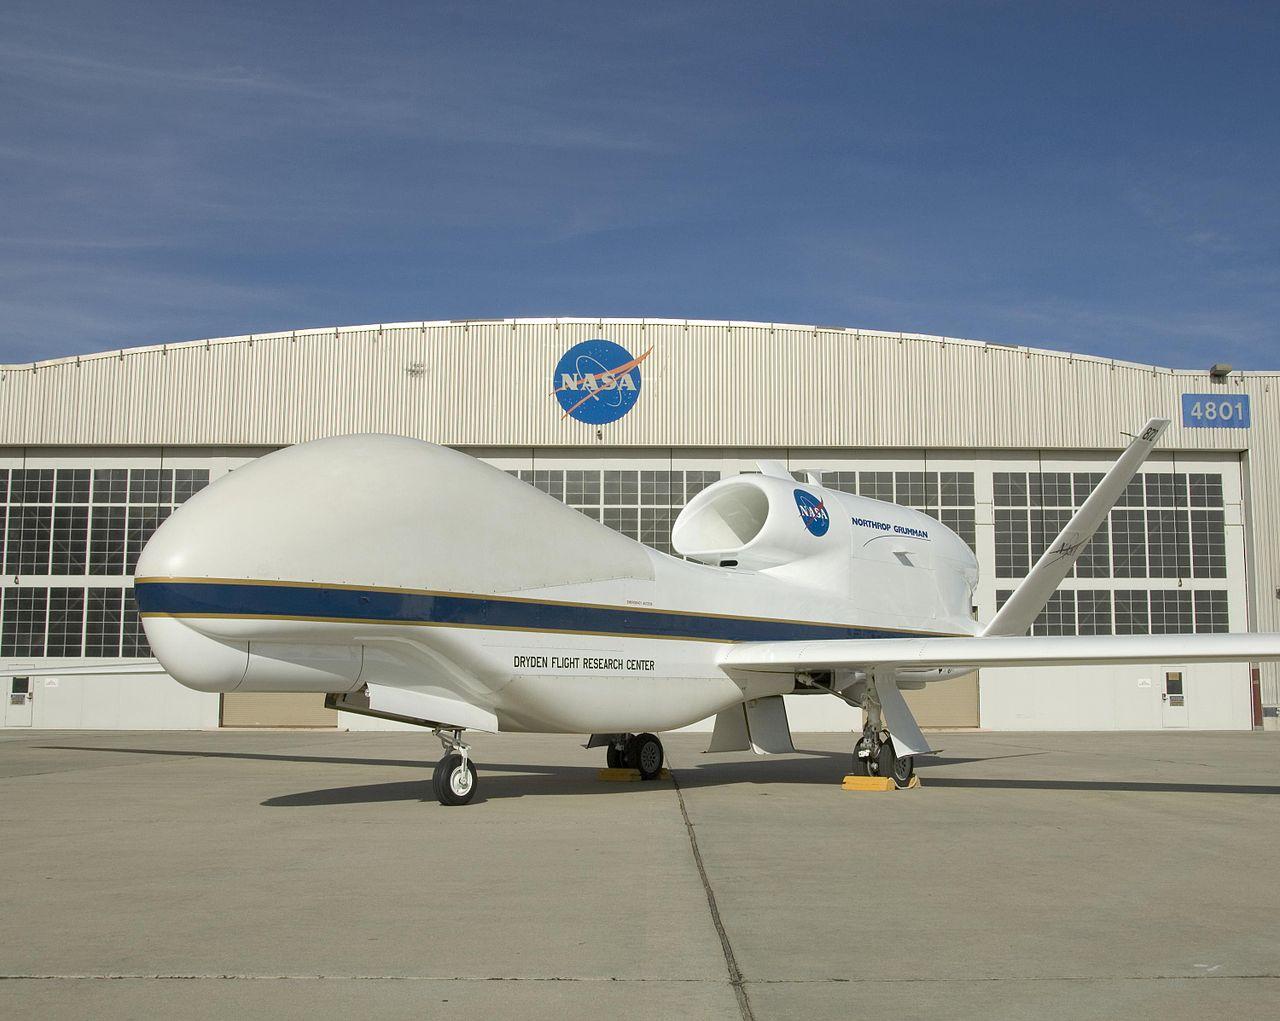 1280px-NASA_Dryden_Global_Hawk